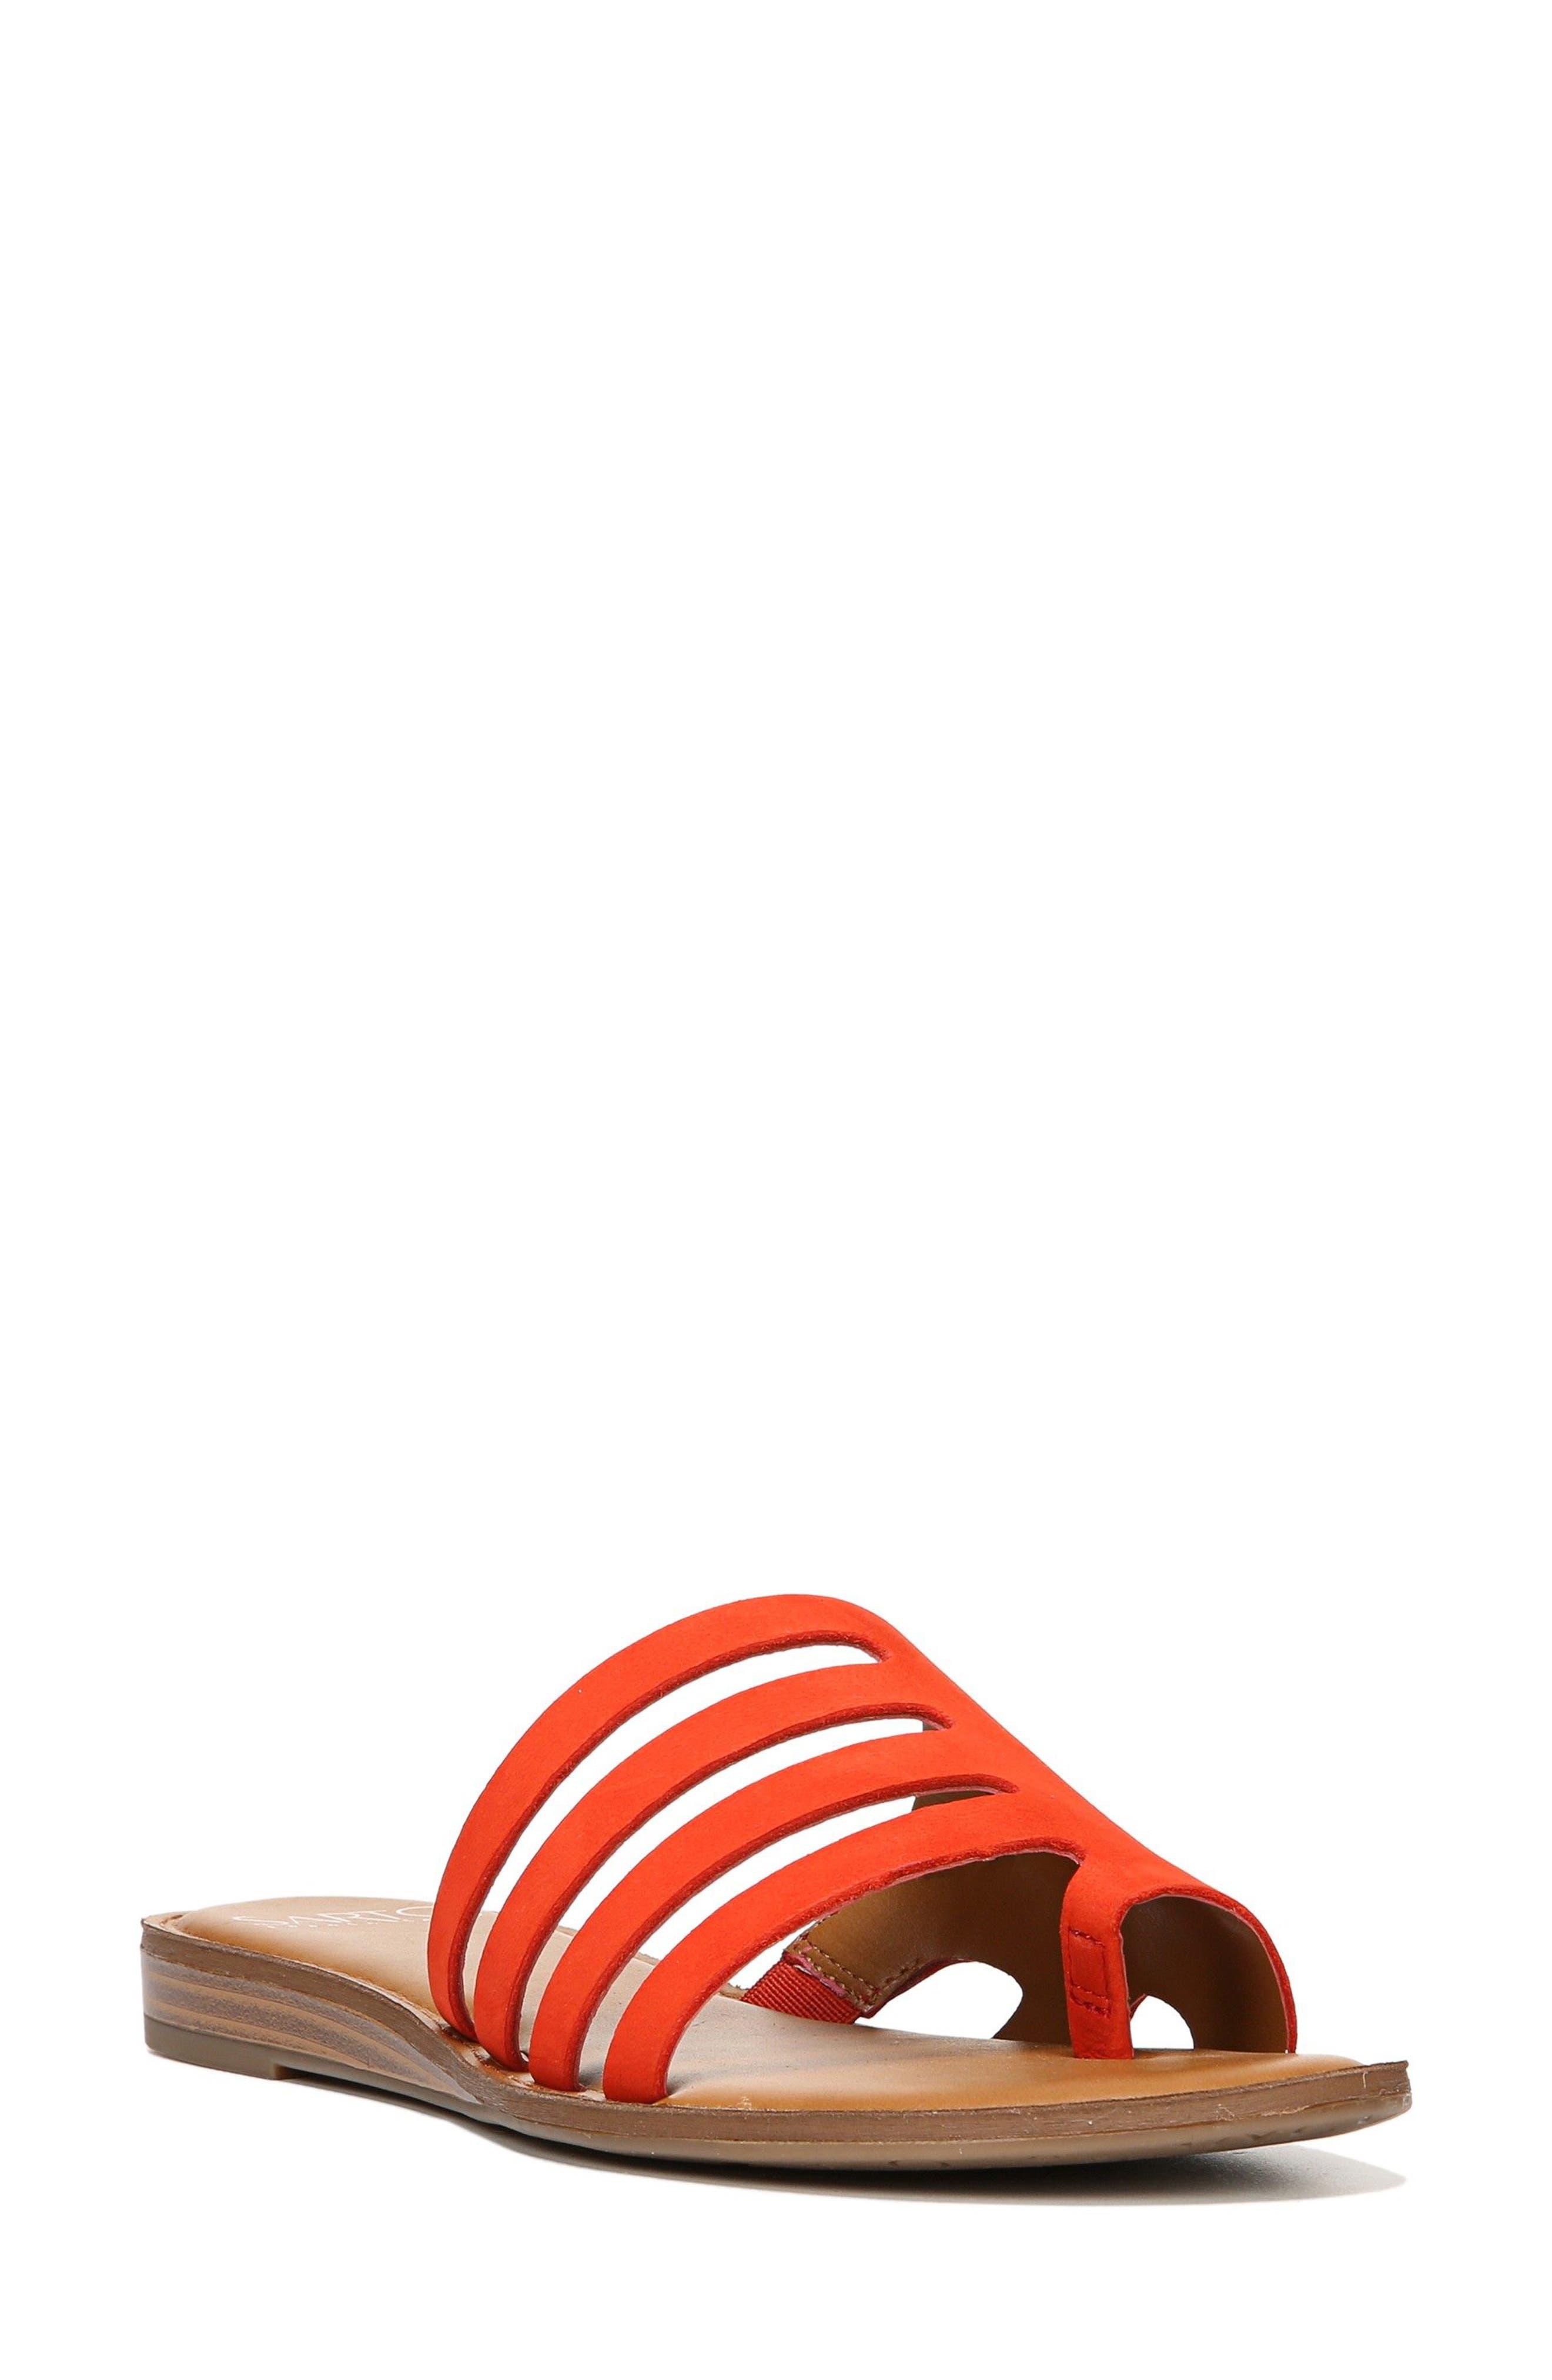 Main Image - SARTO by Franco Sarto Gala Slide Sandal (Women)